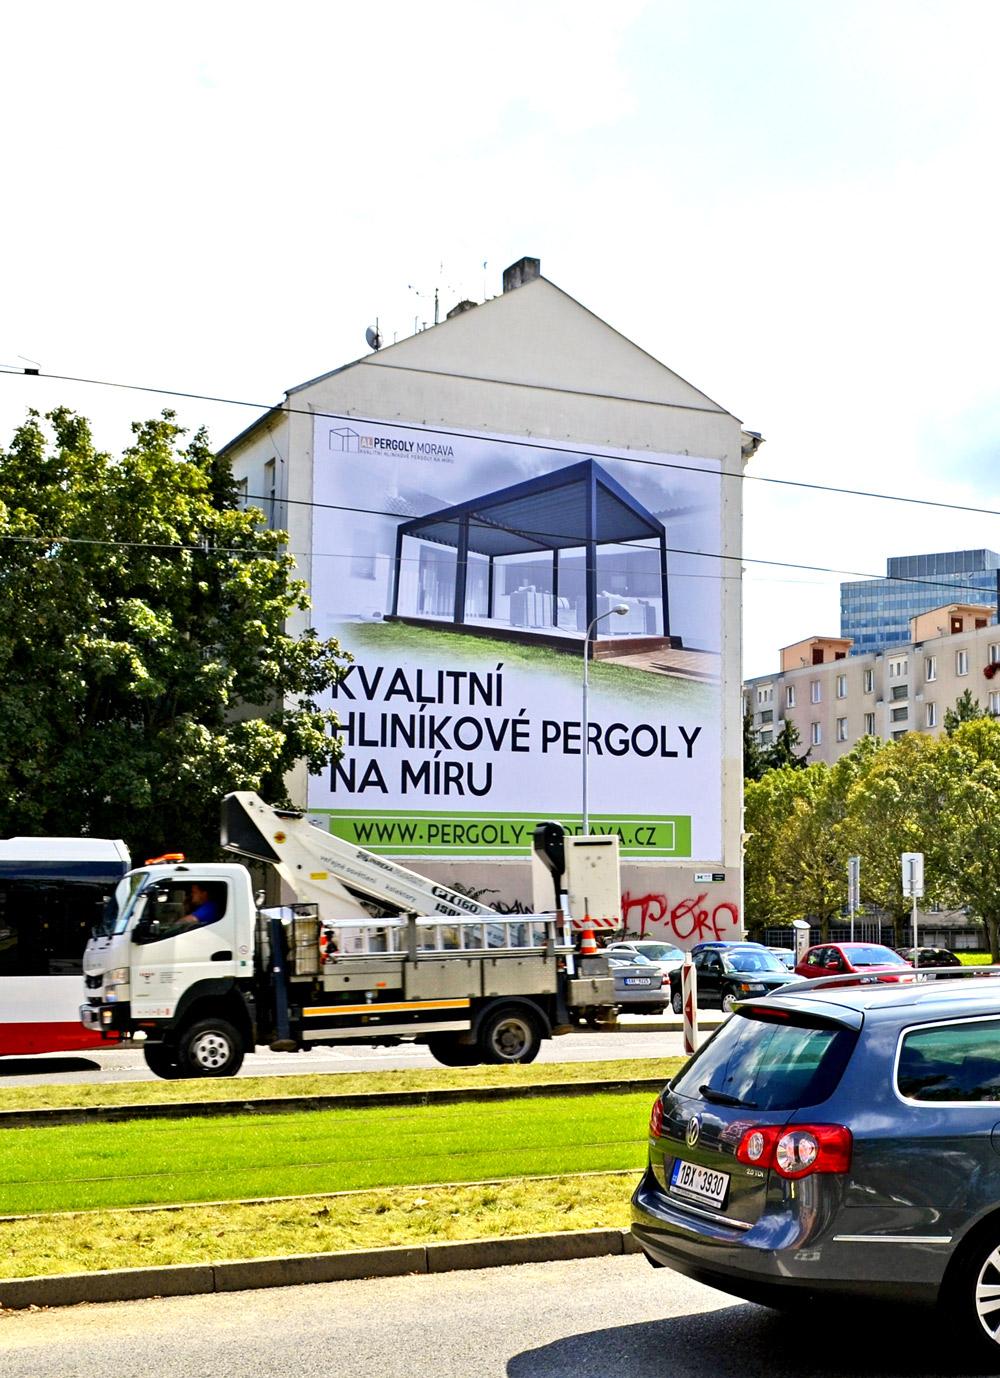 OOH---Venkovní-reklamní-plocha-Werek-Media-RONDO-037ZB-Křídlovická-Brno---klient-Pergoly-Morava---kampaň-2020-09-den01-proweb